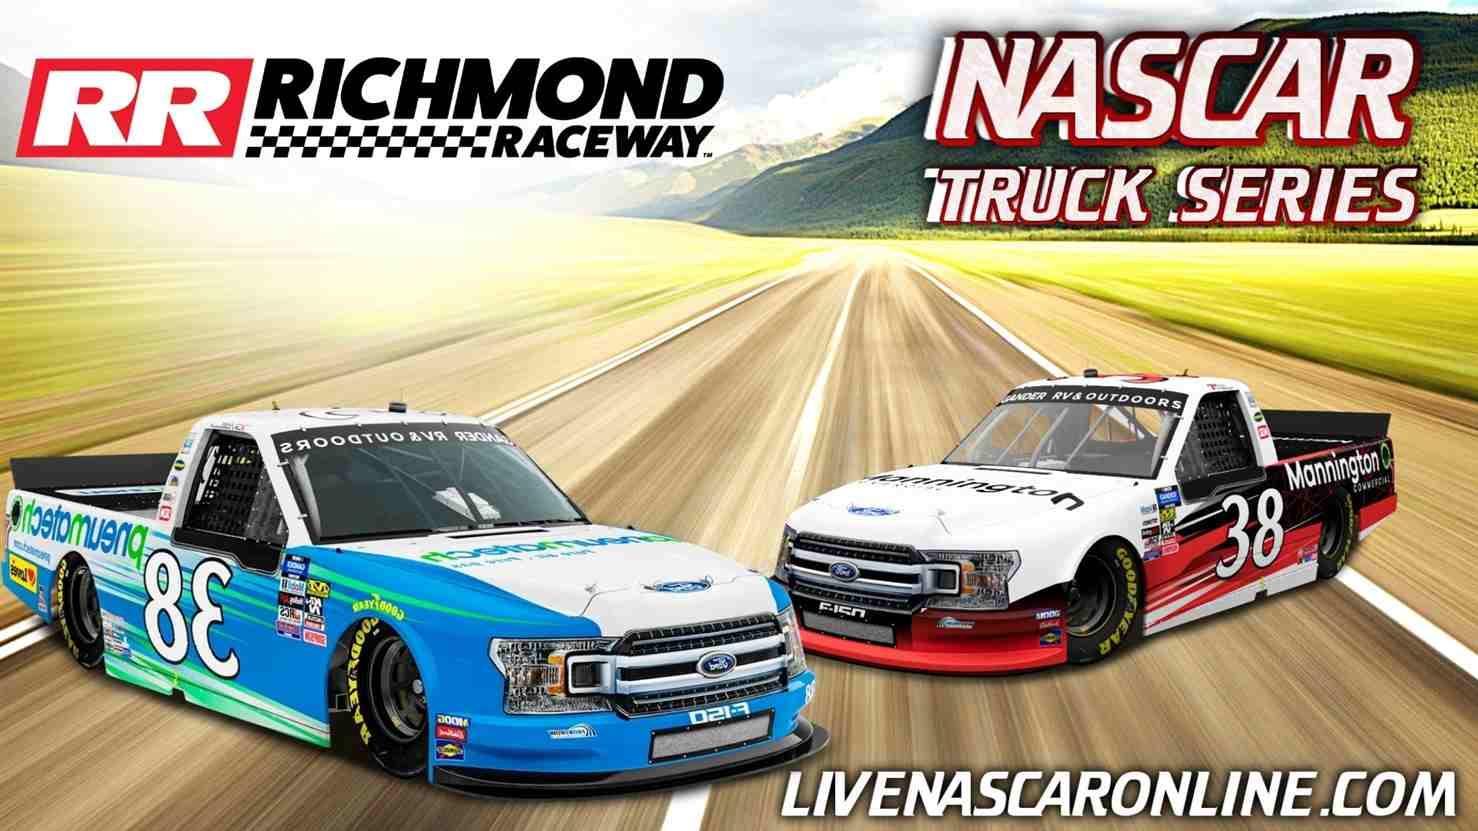 NASCAR Truck Race at Richmond Live Stream 2021